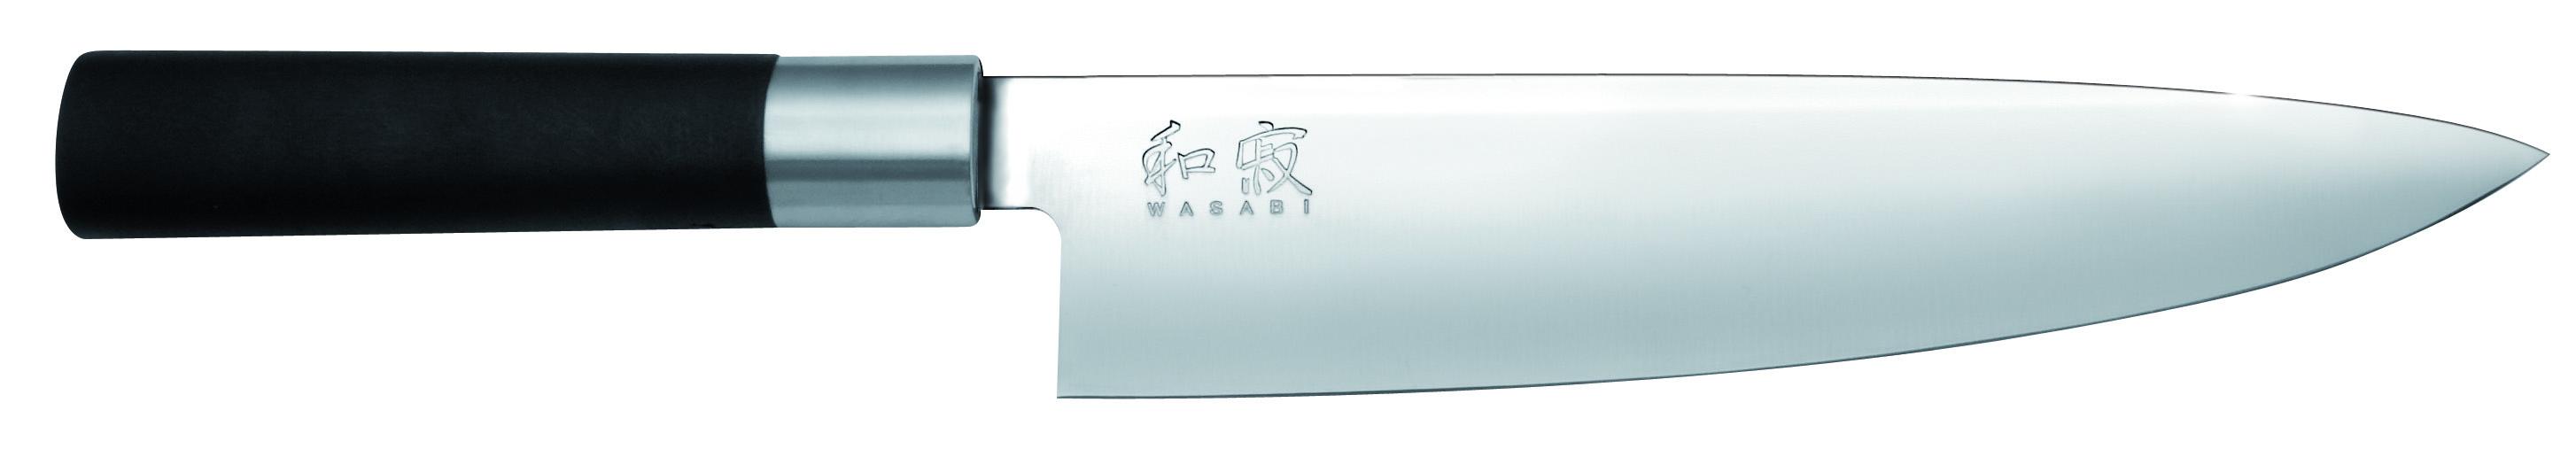 Japonský nôž šéfkuchára Wasabi Black 6720C